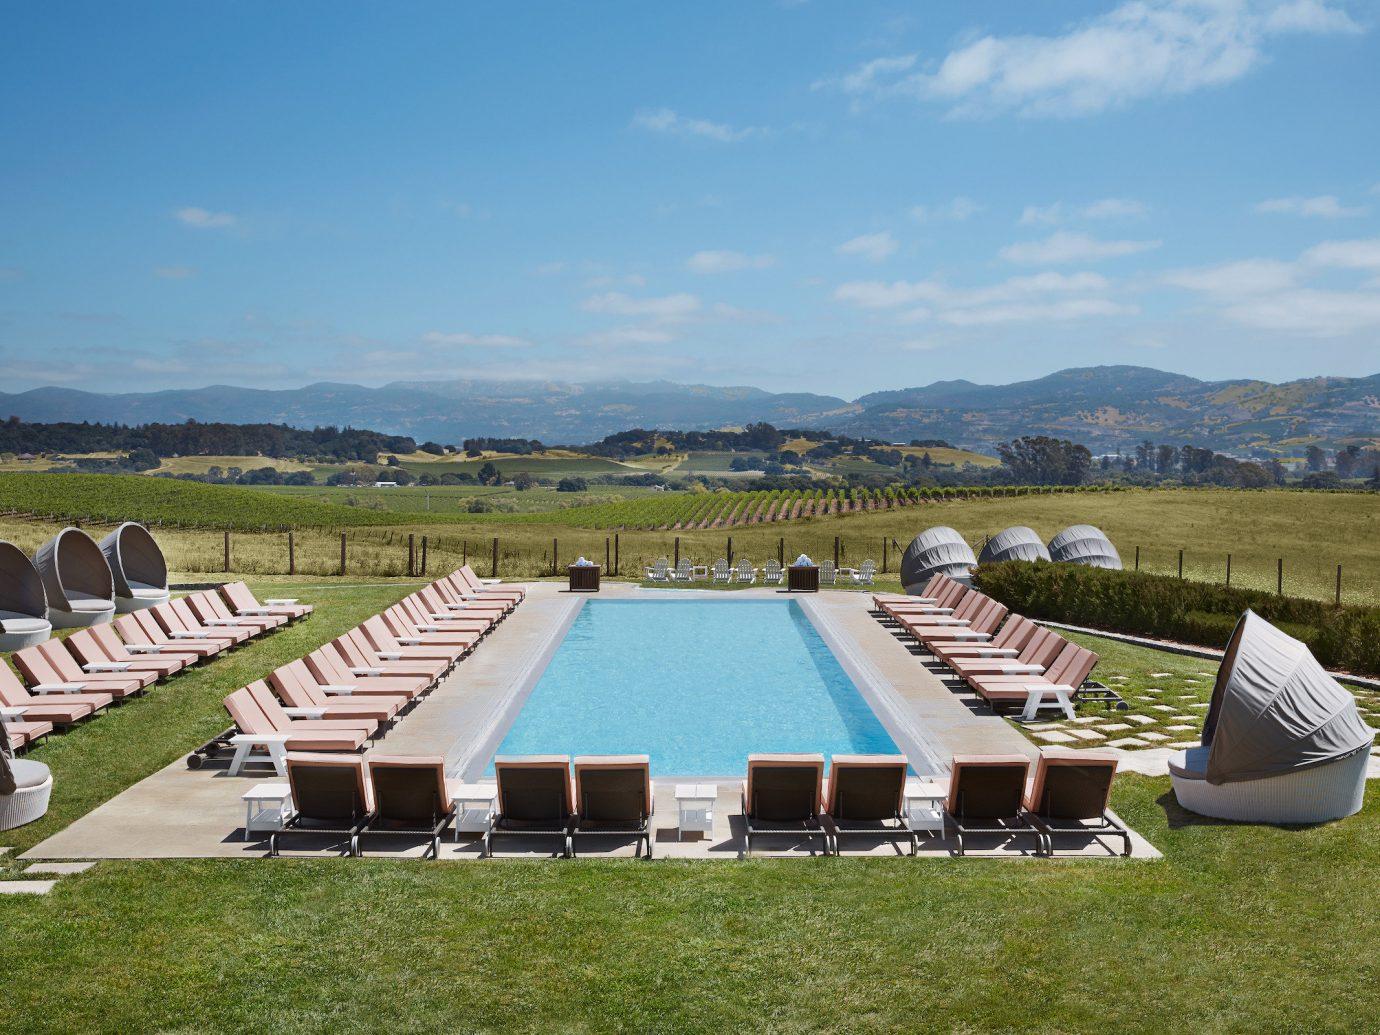 Hotels Romance Spa Retreats Trip Ideas grass outdoor swimming pool sport venue mountain estate lawn stadium backyard set